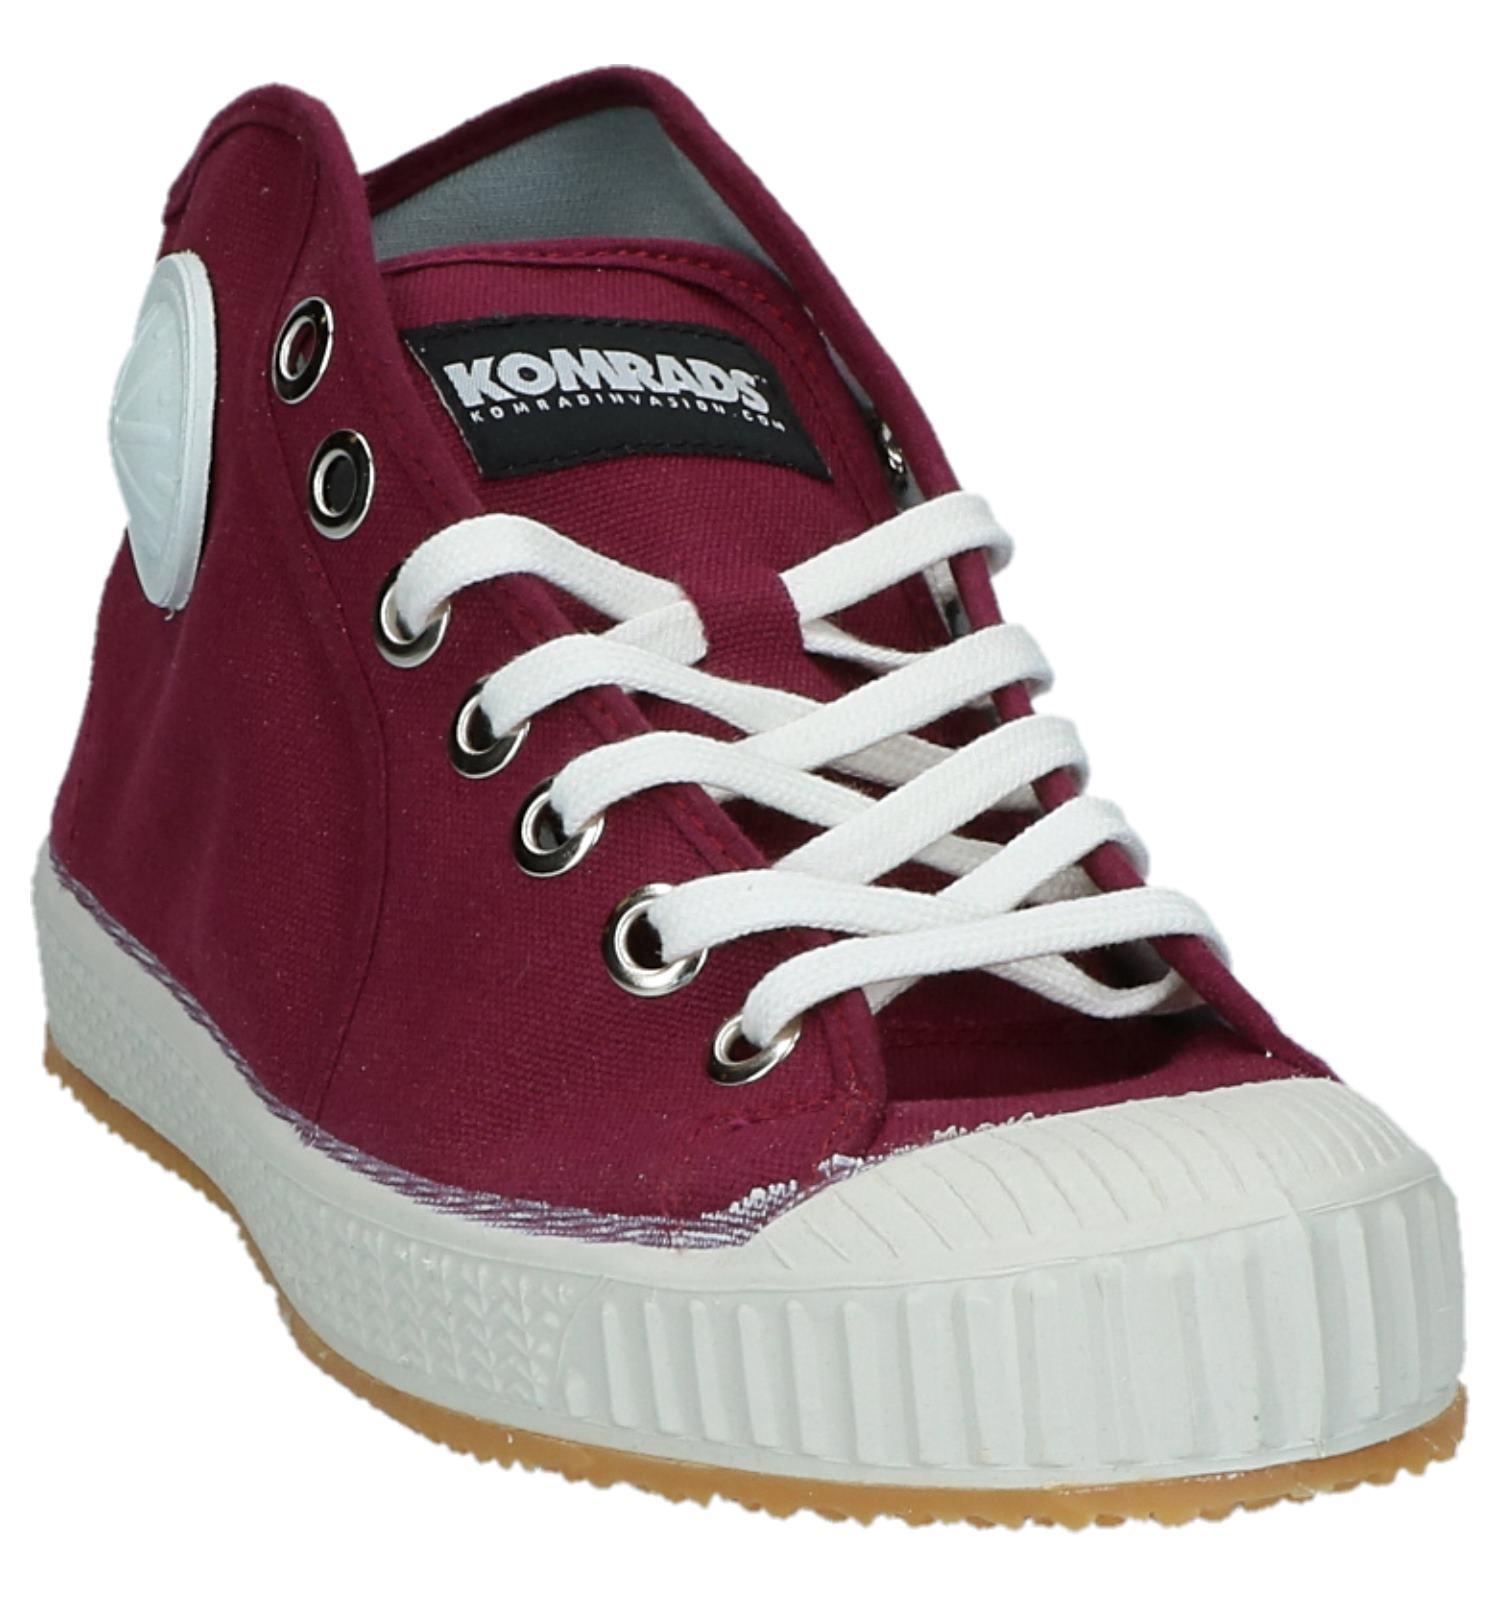 Hoge Bordeaux Belgrado Sneakers Komrads yv0wONn8m